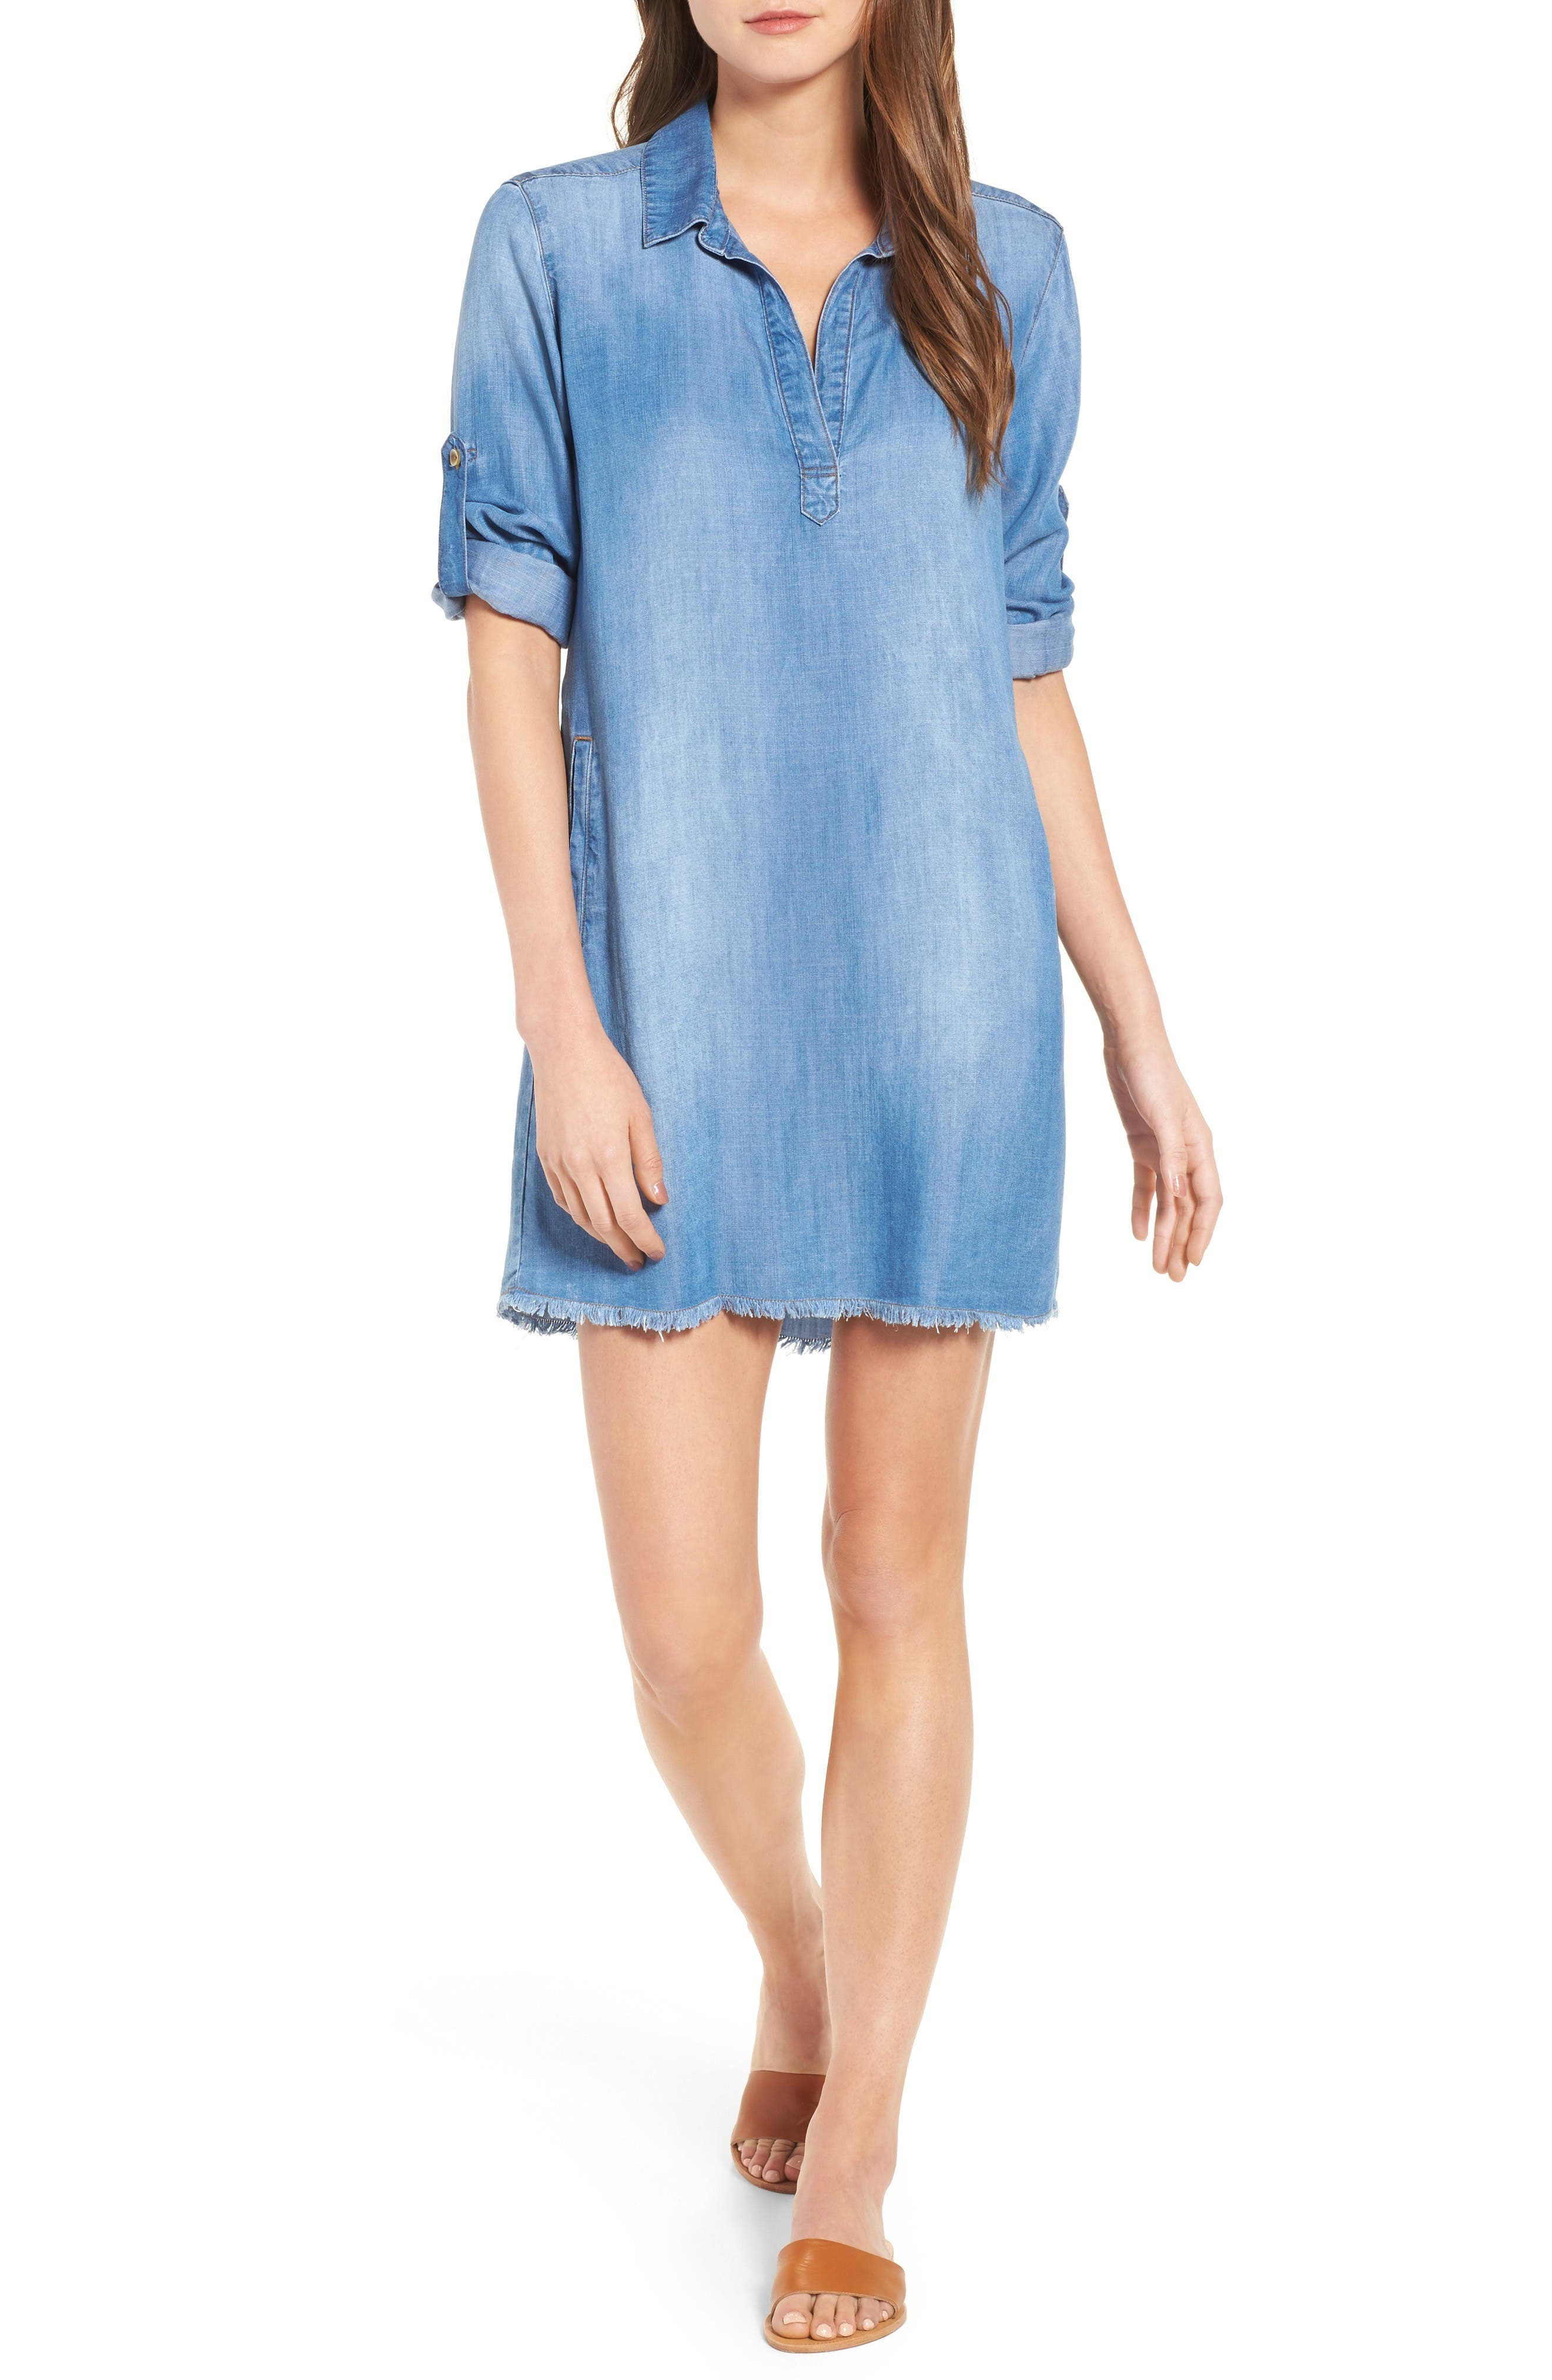 Alternate Image 1 Selected - Side Stitch Frayed Hem Denim Shirtdress